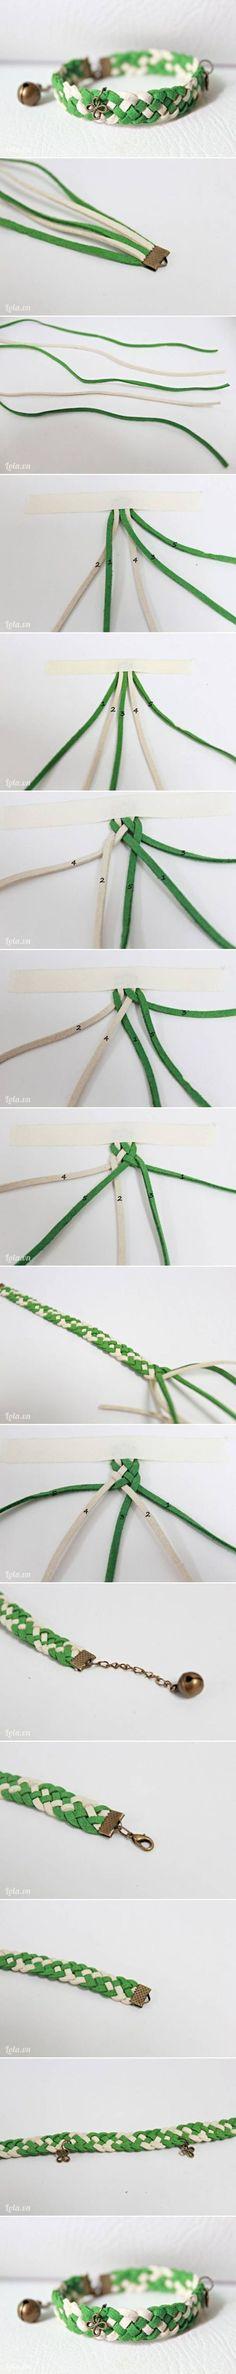 DIY Nice Spring Wristband DIY Projects / UsefulDIY.com